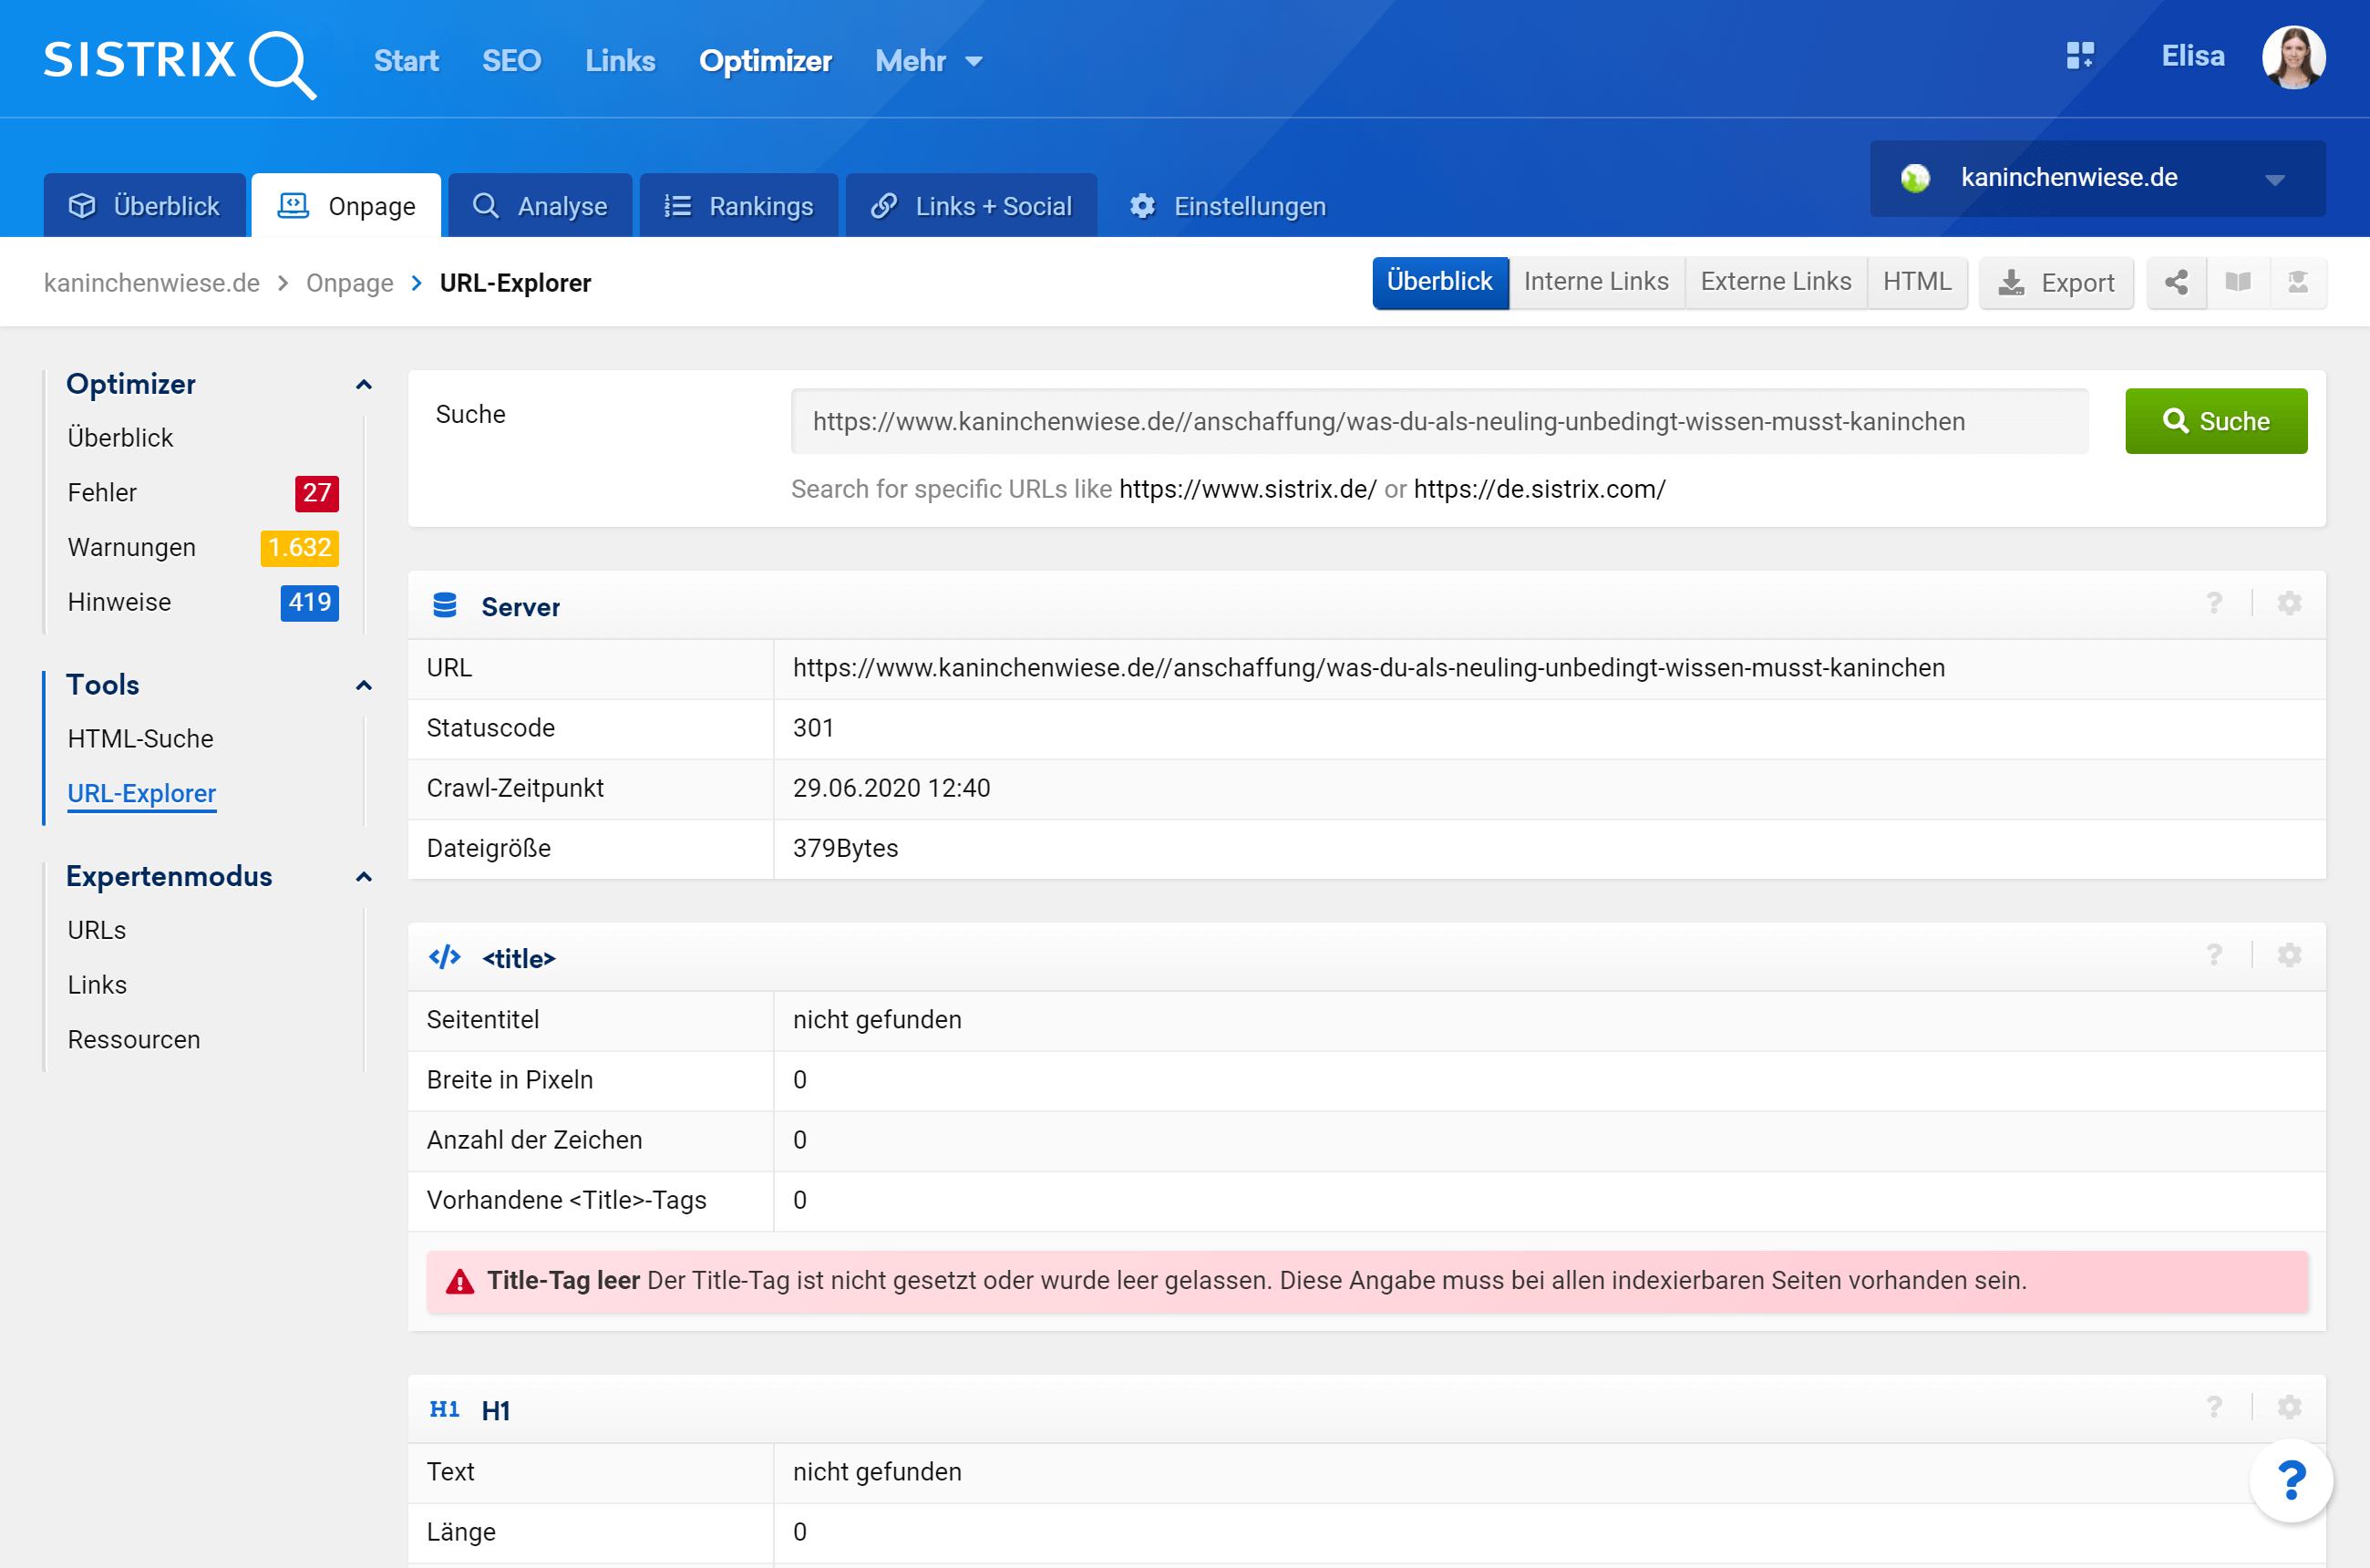 URL Explorer im SISTRIX Optimizer